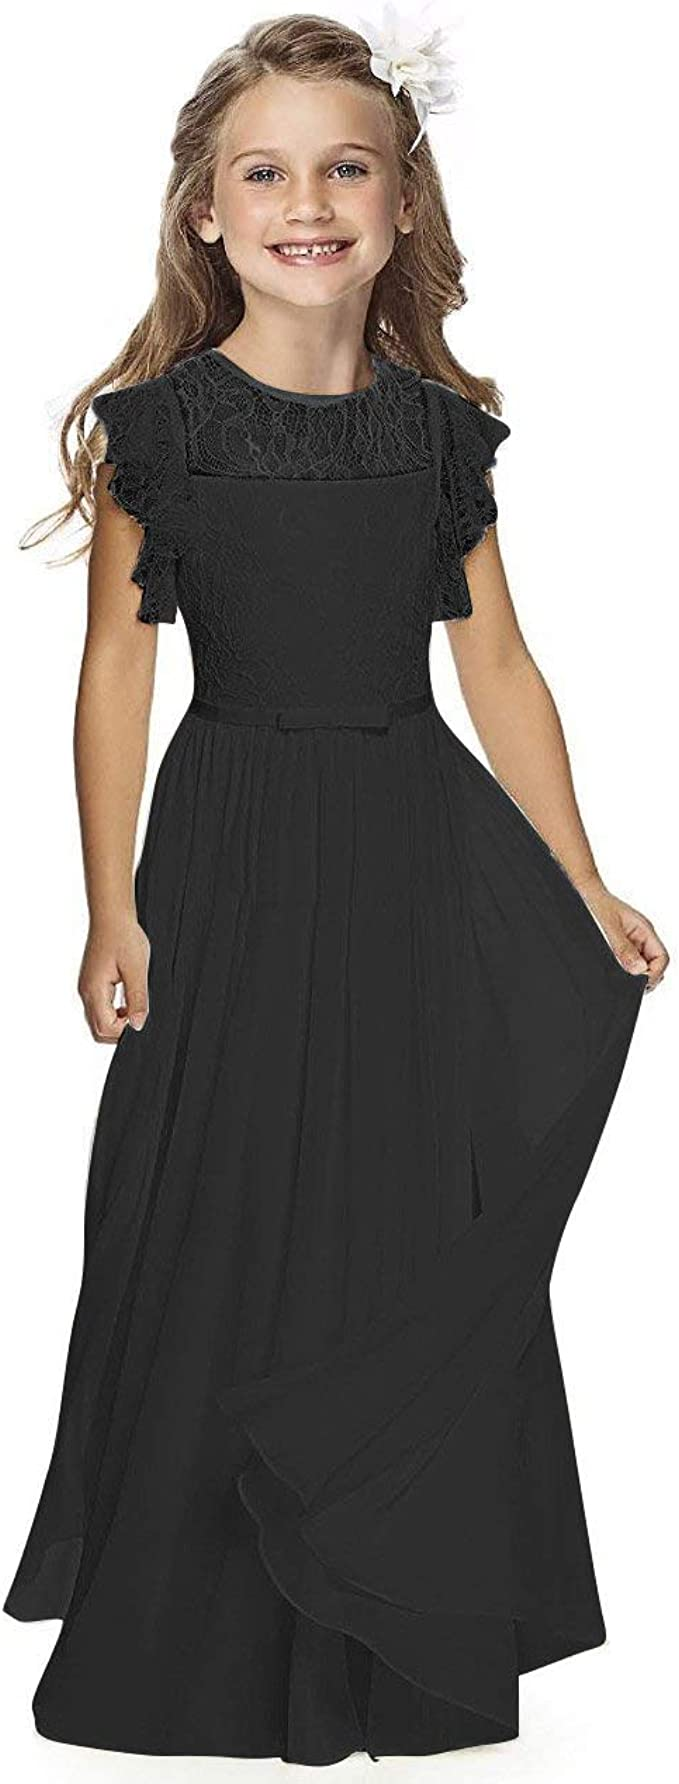 Amazon.com: Fancy Girls vestidos de comunión para ...